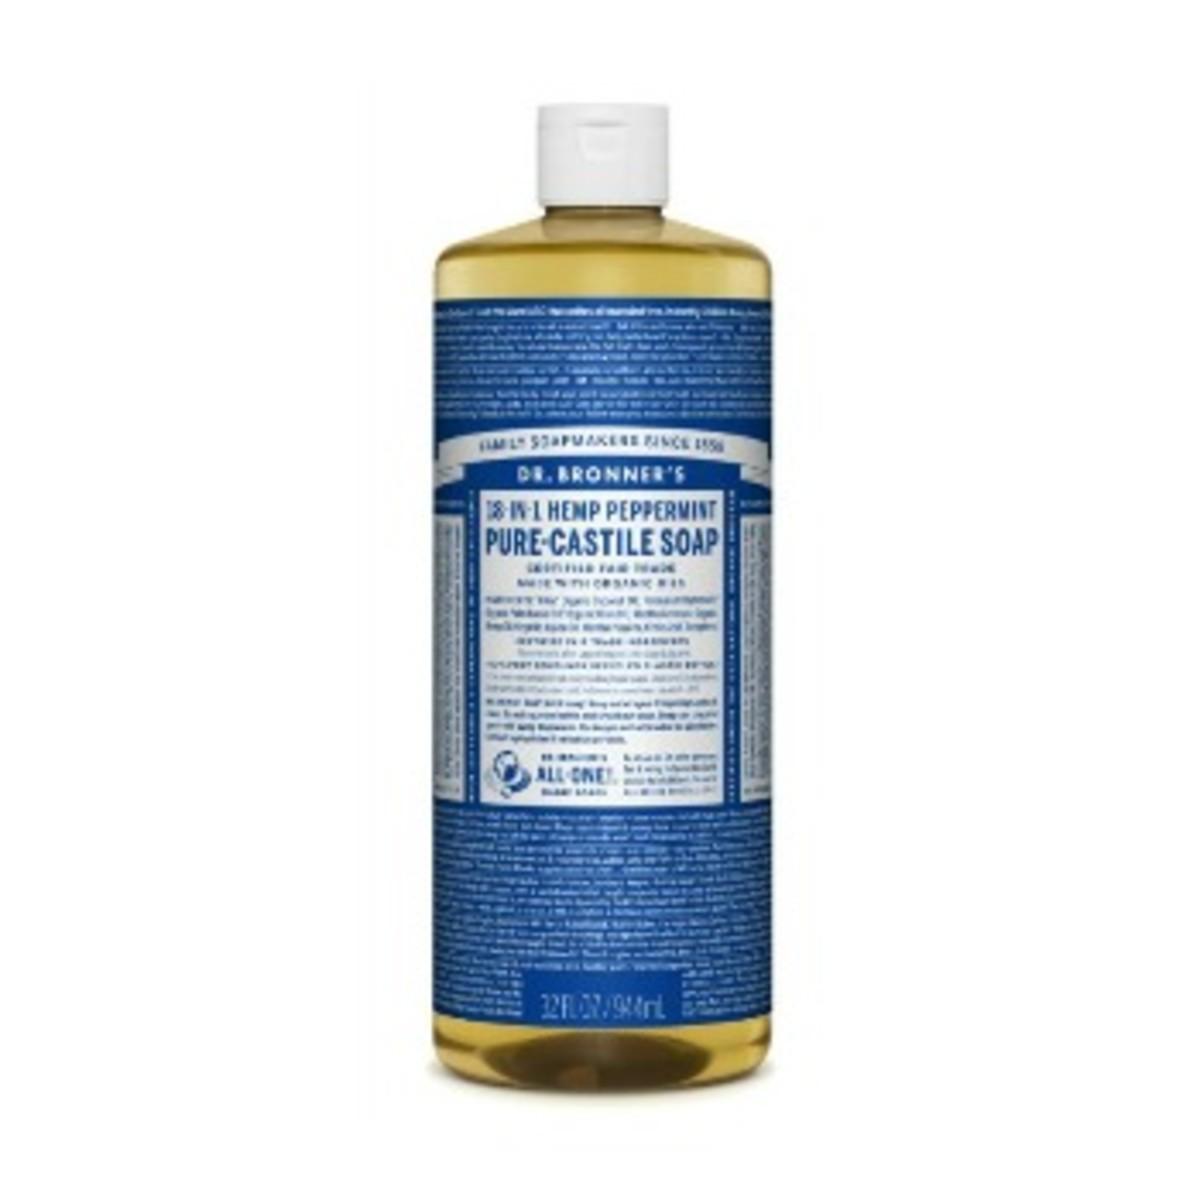 Dr. Bronner's Pure Castile Soap